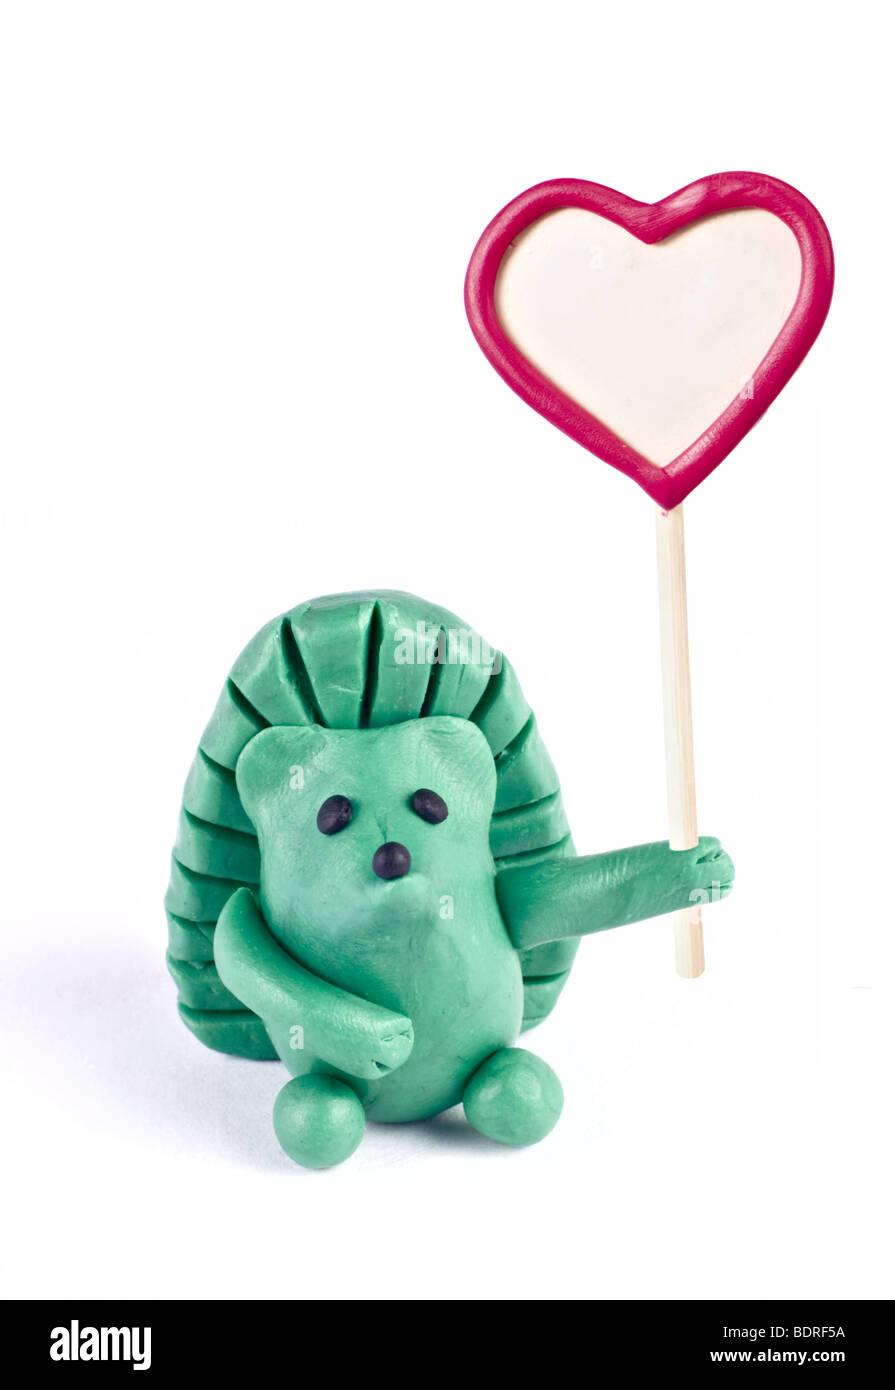 Plasticine hedgehog retaining heart-shaped banner - Stock Image